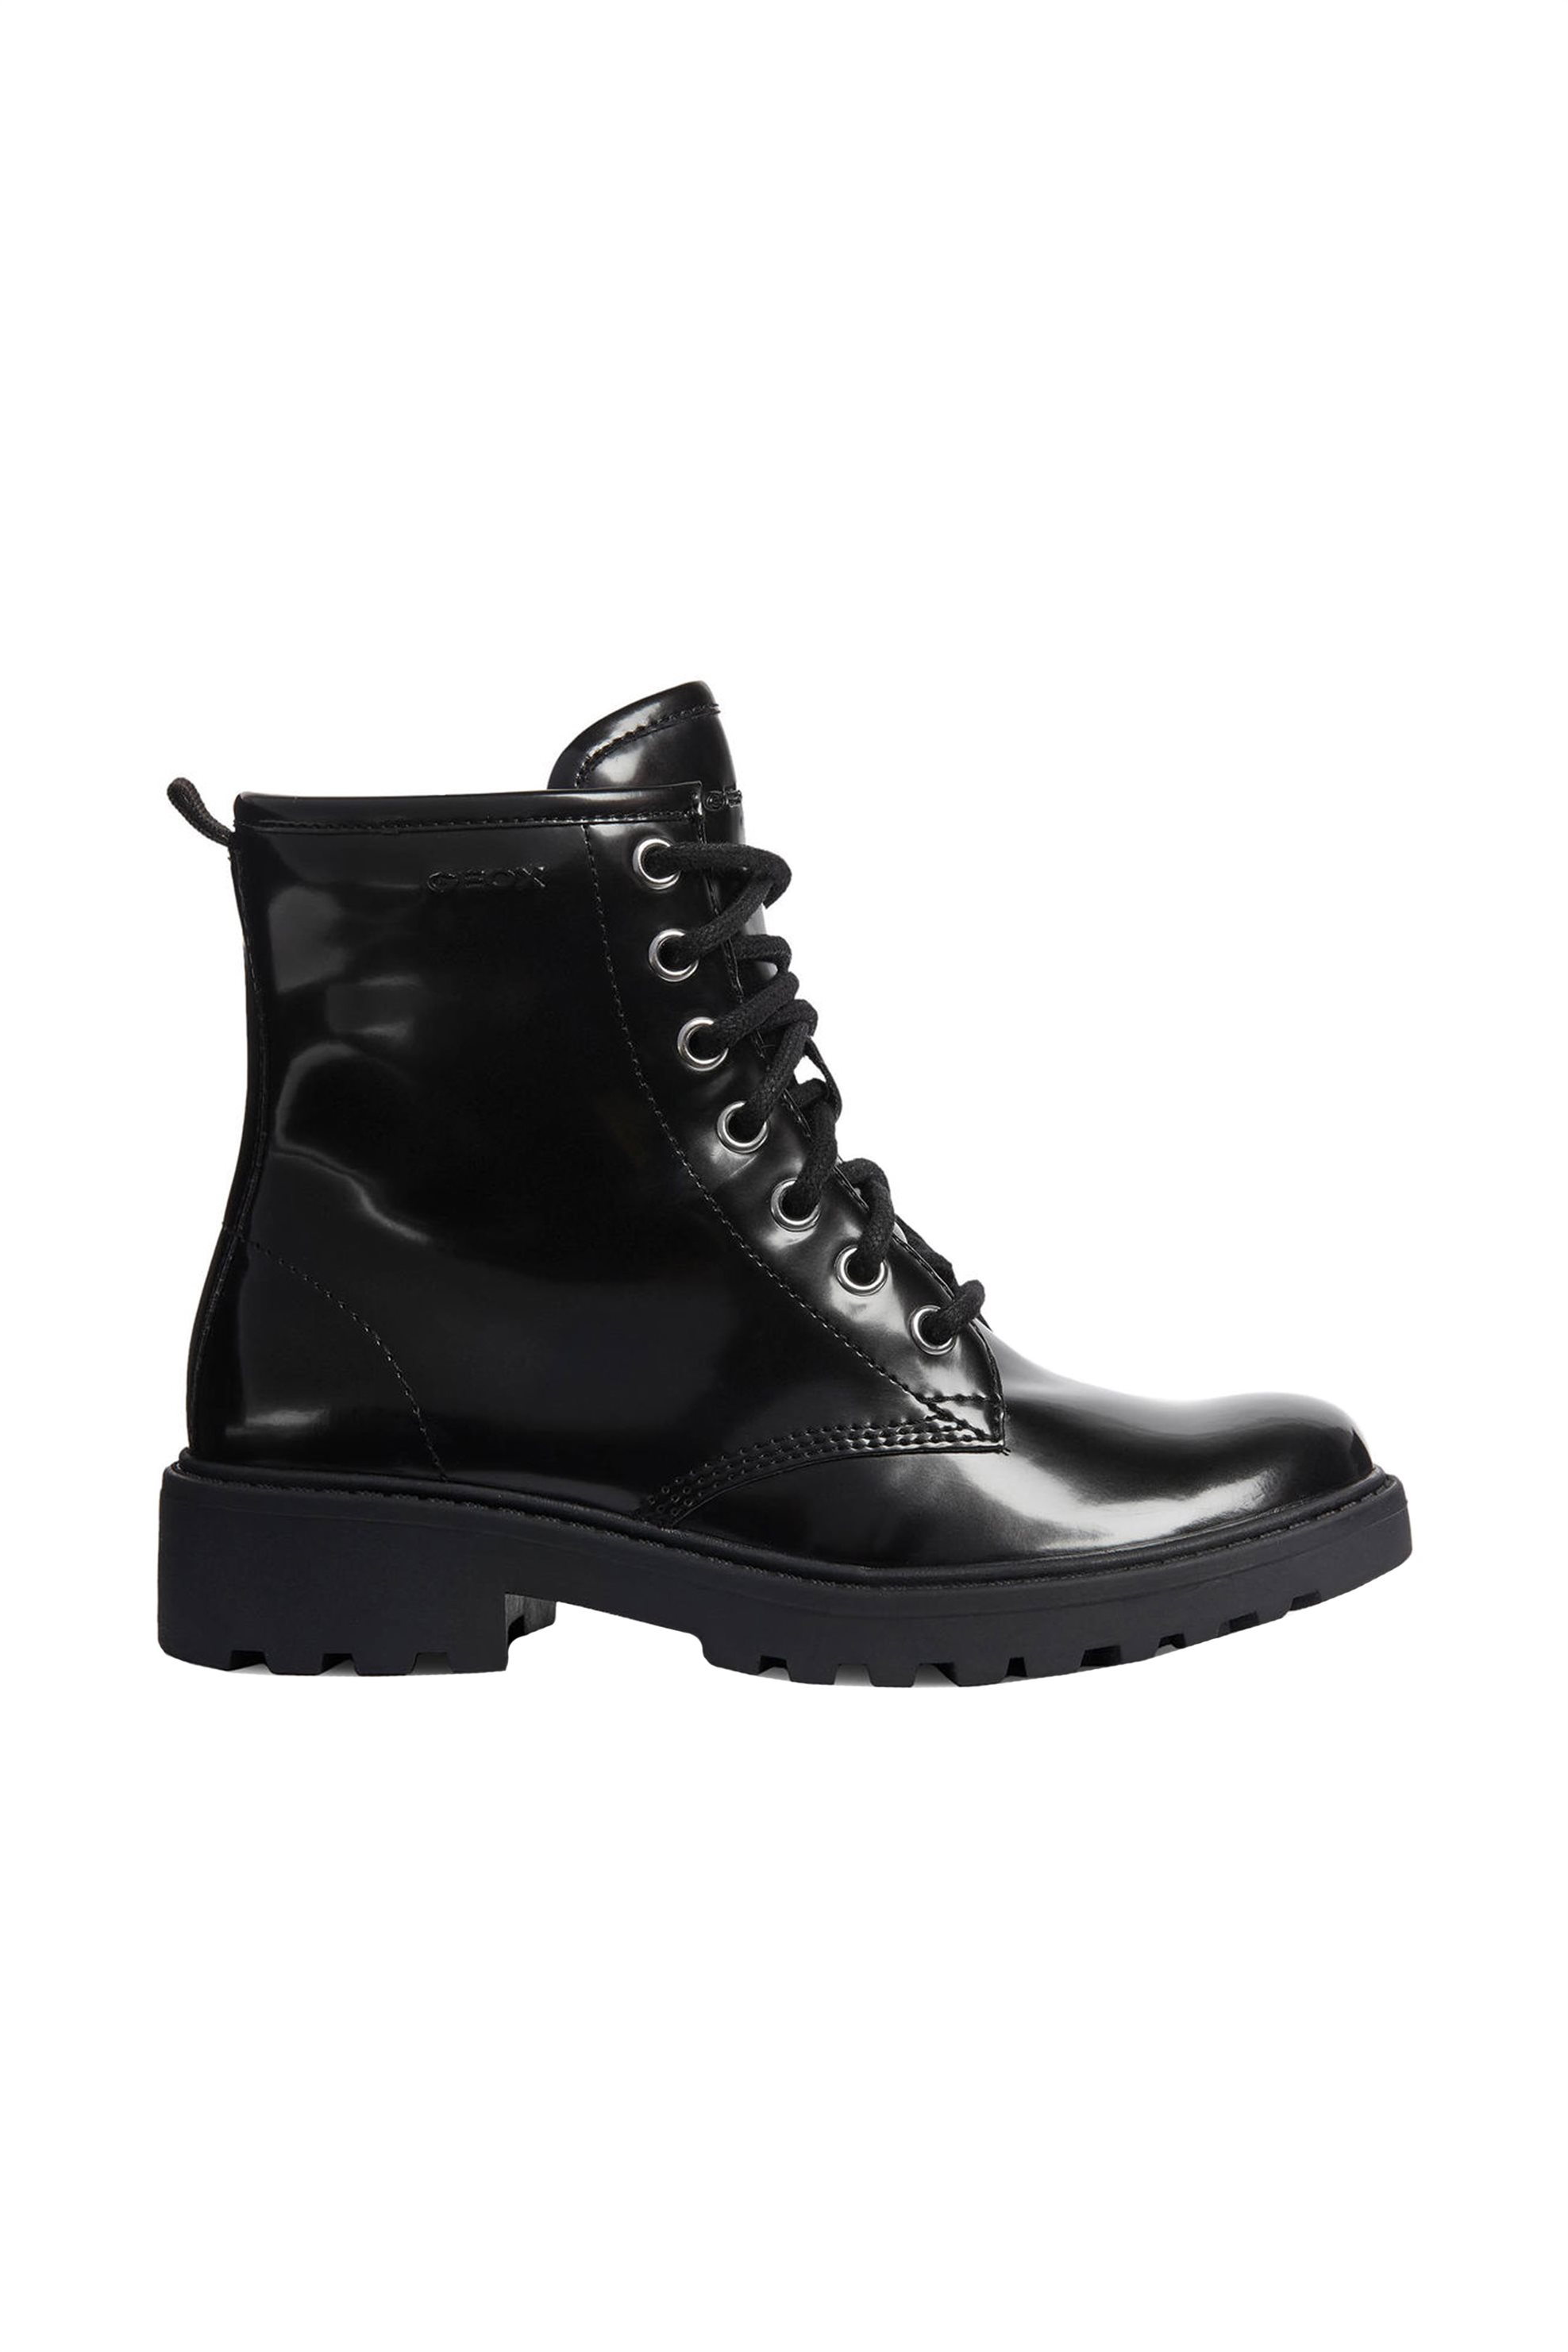 Geox μποτάκια παιδικά JR Casey - J5420K-1 - Μαύρο παιδι   παπουτσια   κορίτσια   μπότες